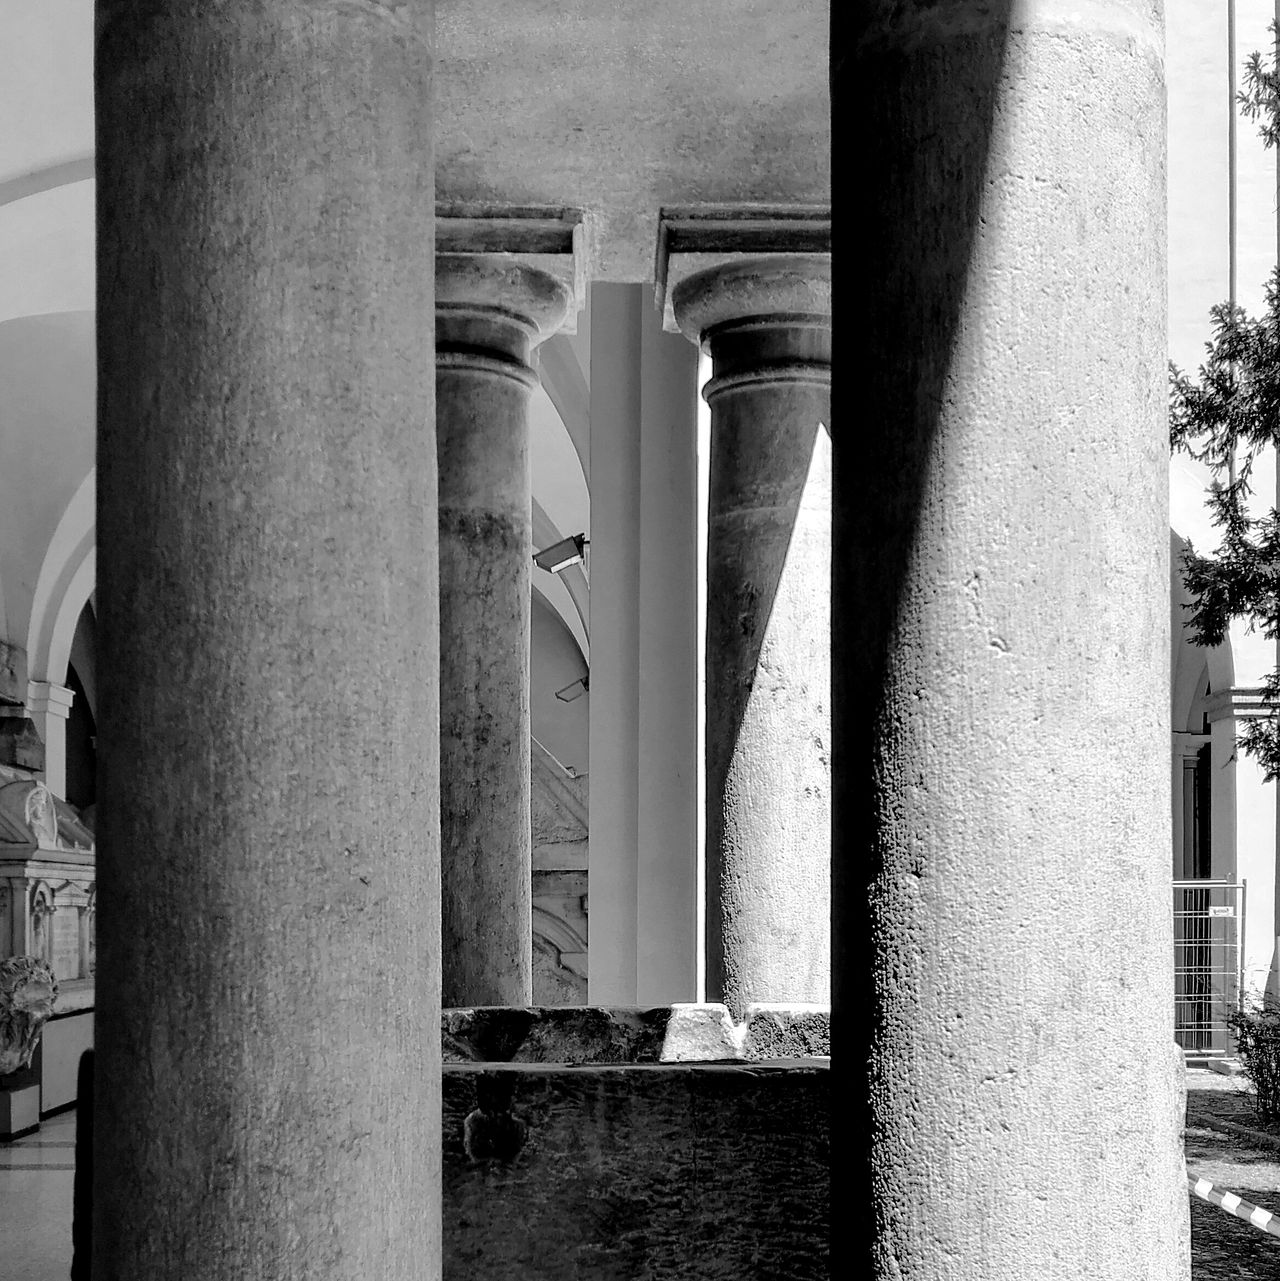 Architecture Columns Colonne Architettura Black And White Bianco E Nero Abstractions In BlackandWhite Punto Di Fuga Vanishing Point Shadows & Lights Ombre Geometry Geometric Shapes Modena Pietra Stone